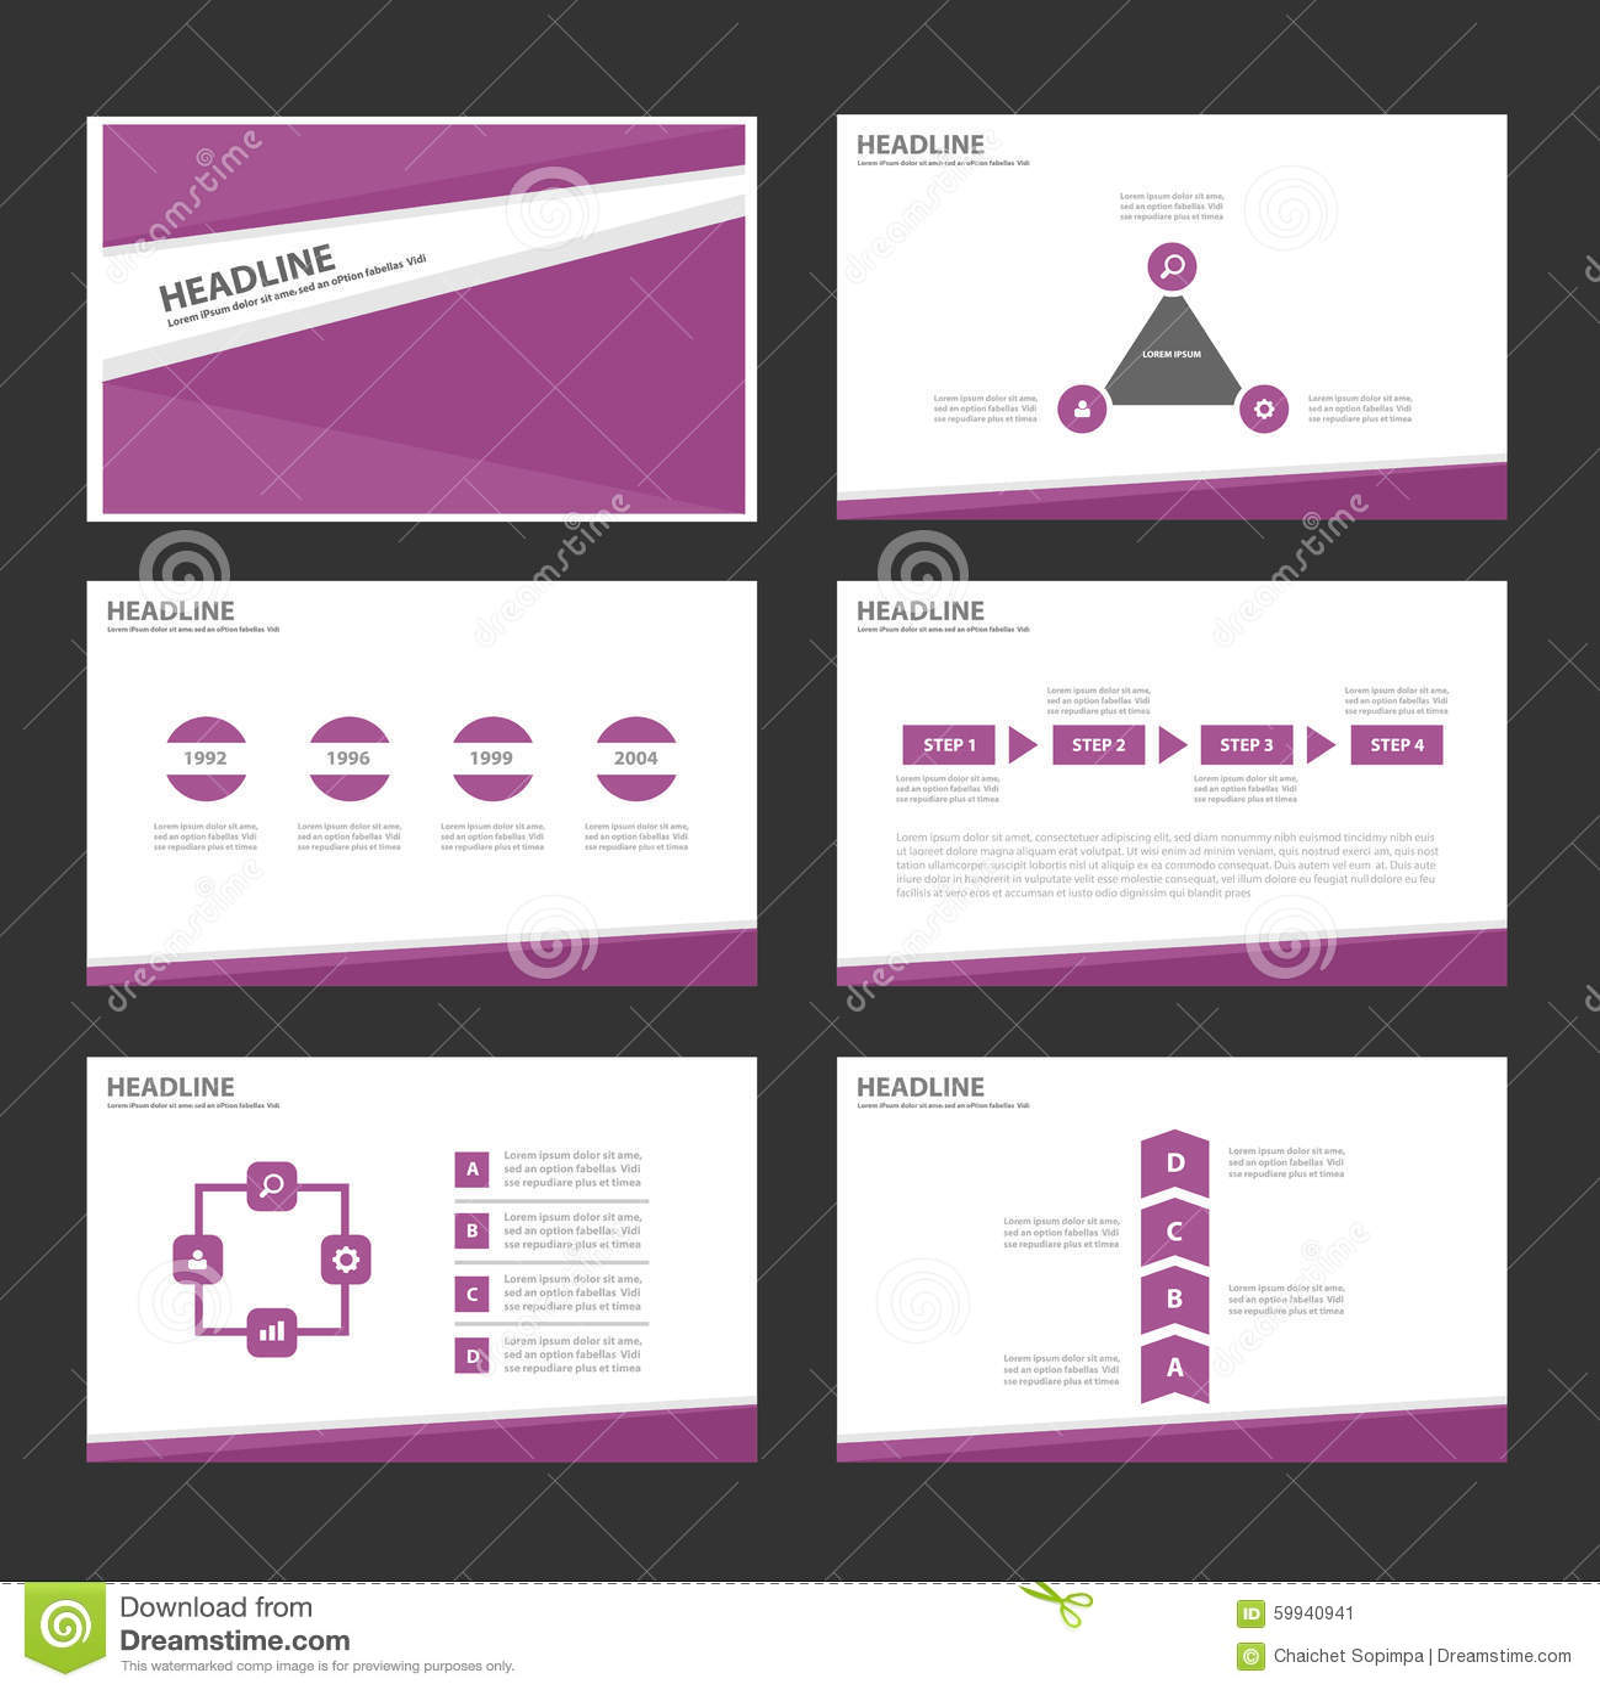 purple infographic elements icon presentation template flat design set for advertising marketing brochure flyer